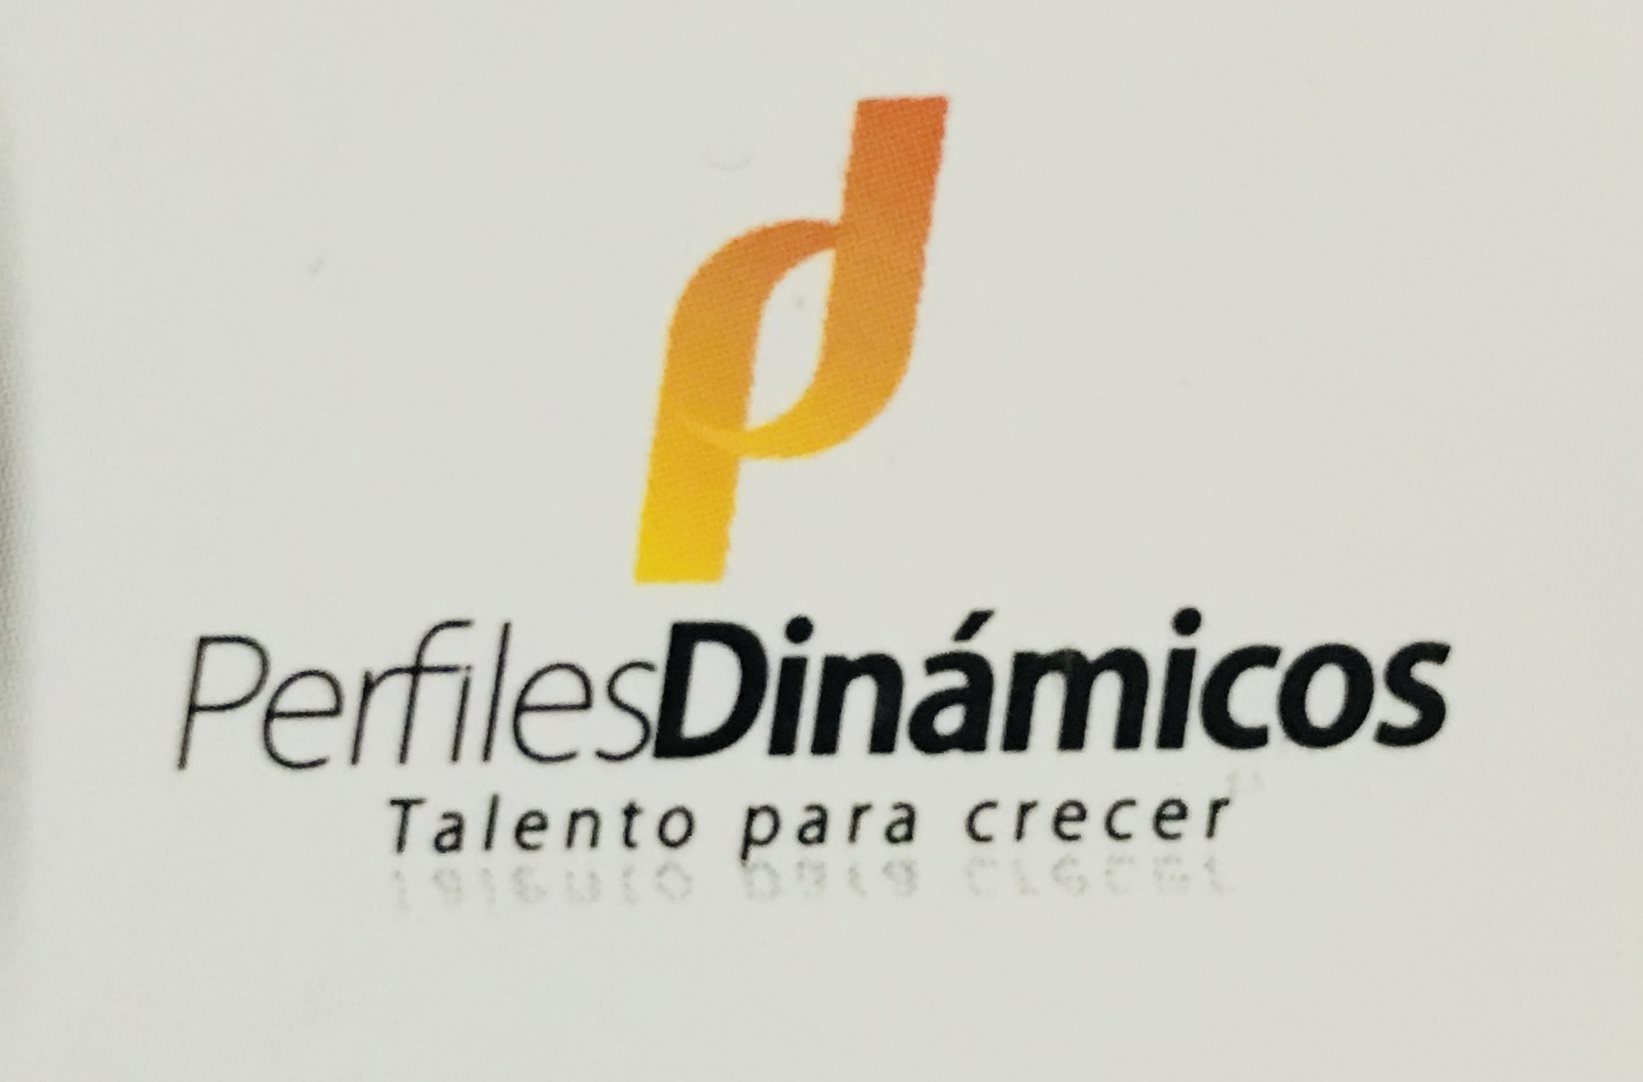 PERFILES DINAMICOS E.S.T S.A.S